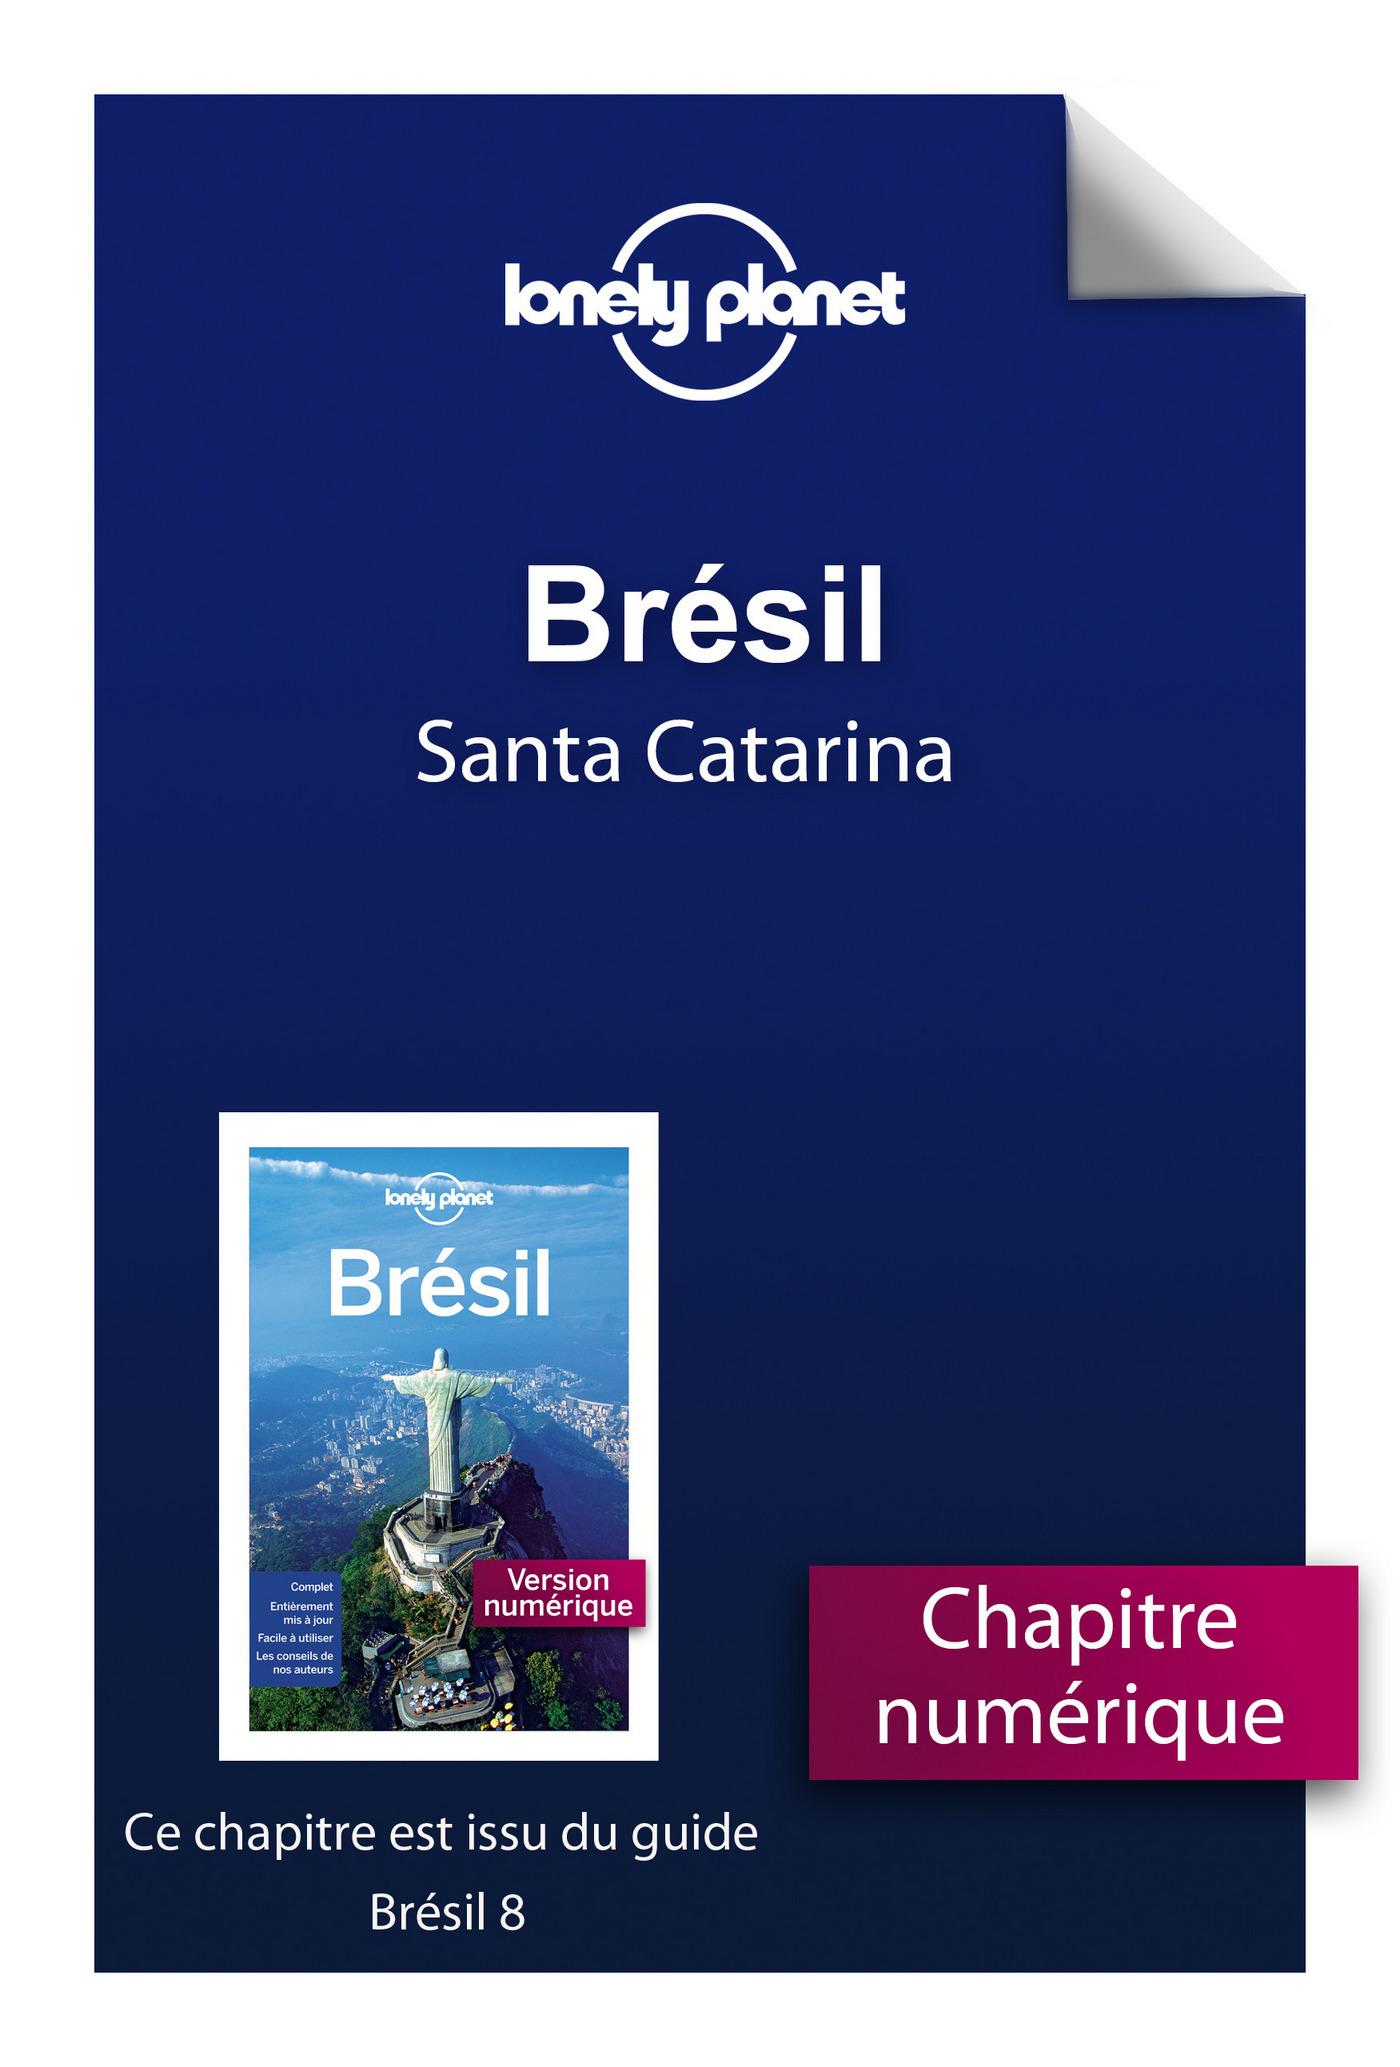 Brésil 8 - Santa Catarina